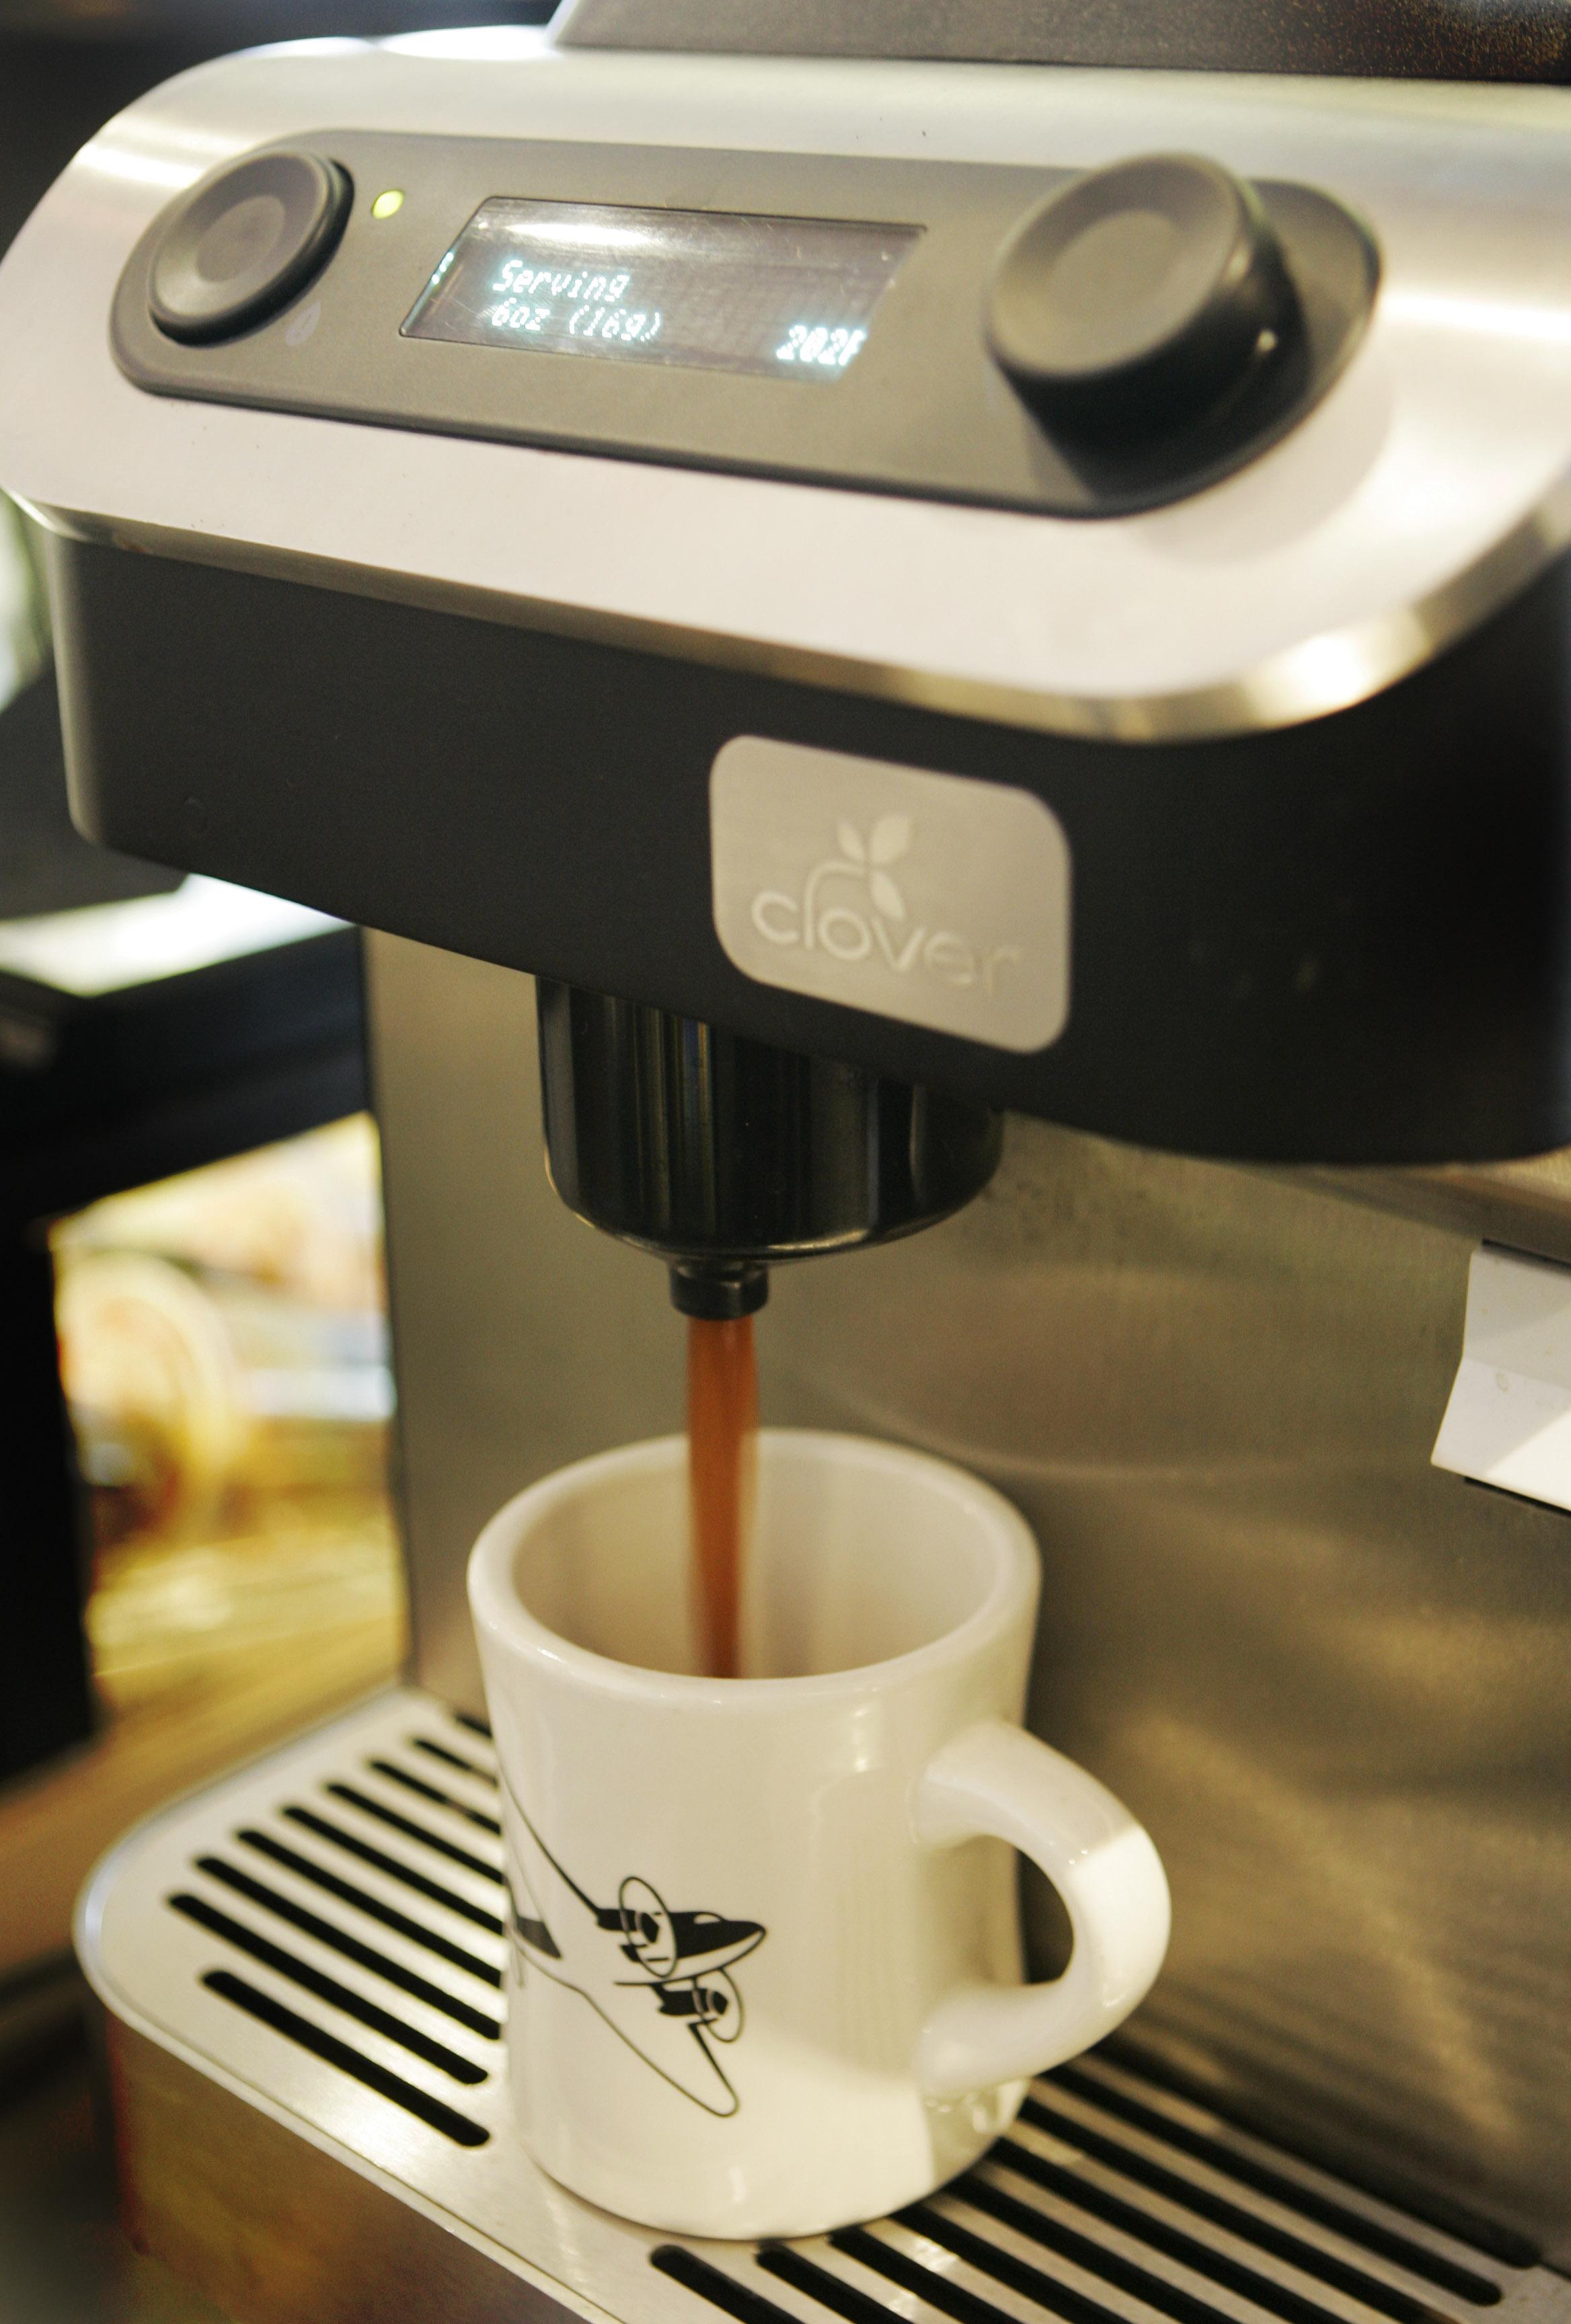 Clover Makes Starbucks Debut The Spokesman Review